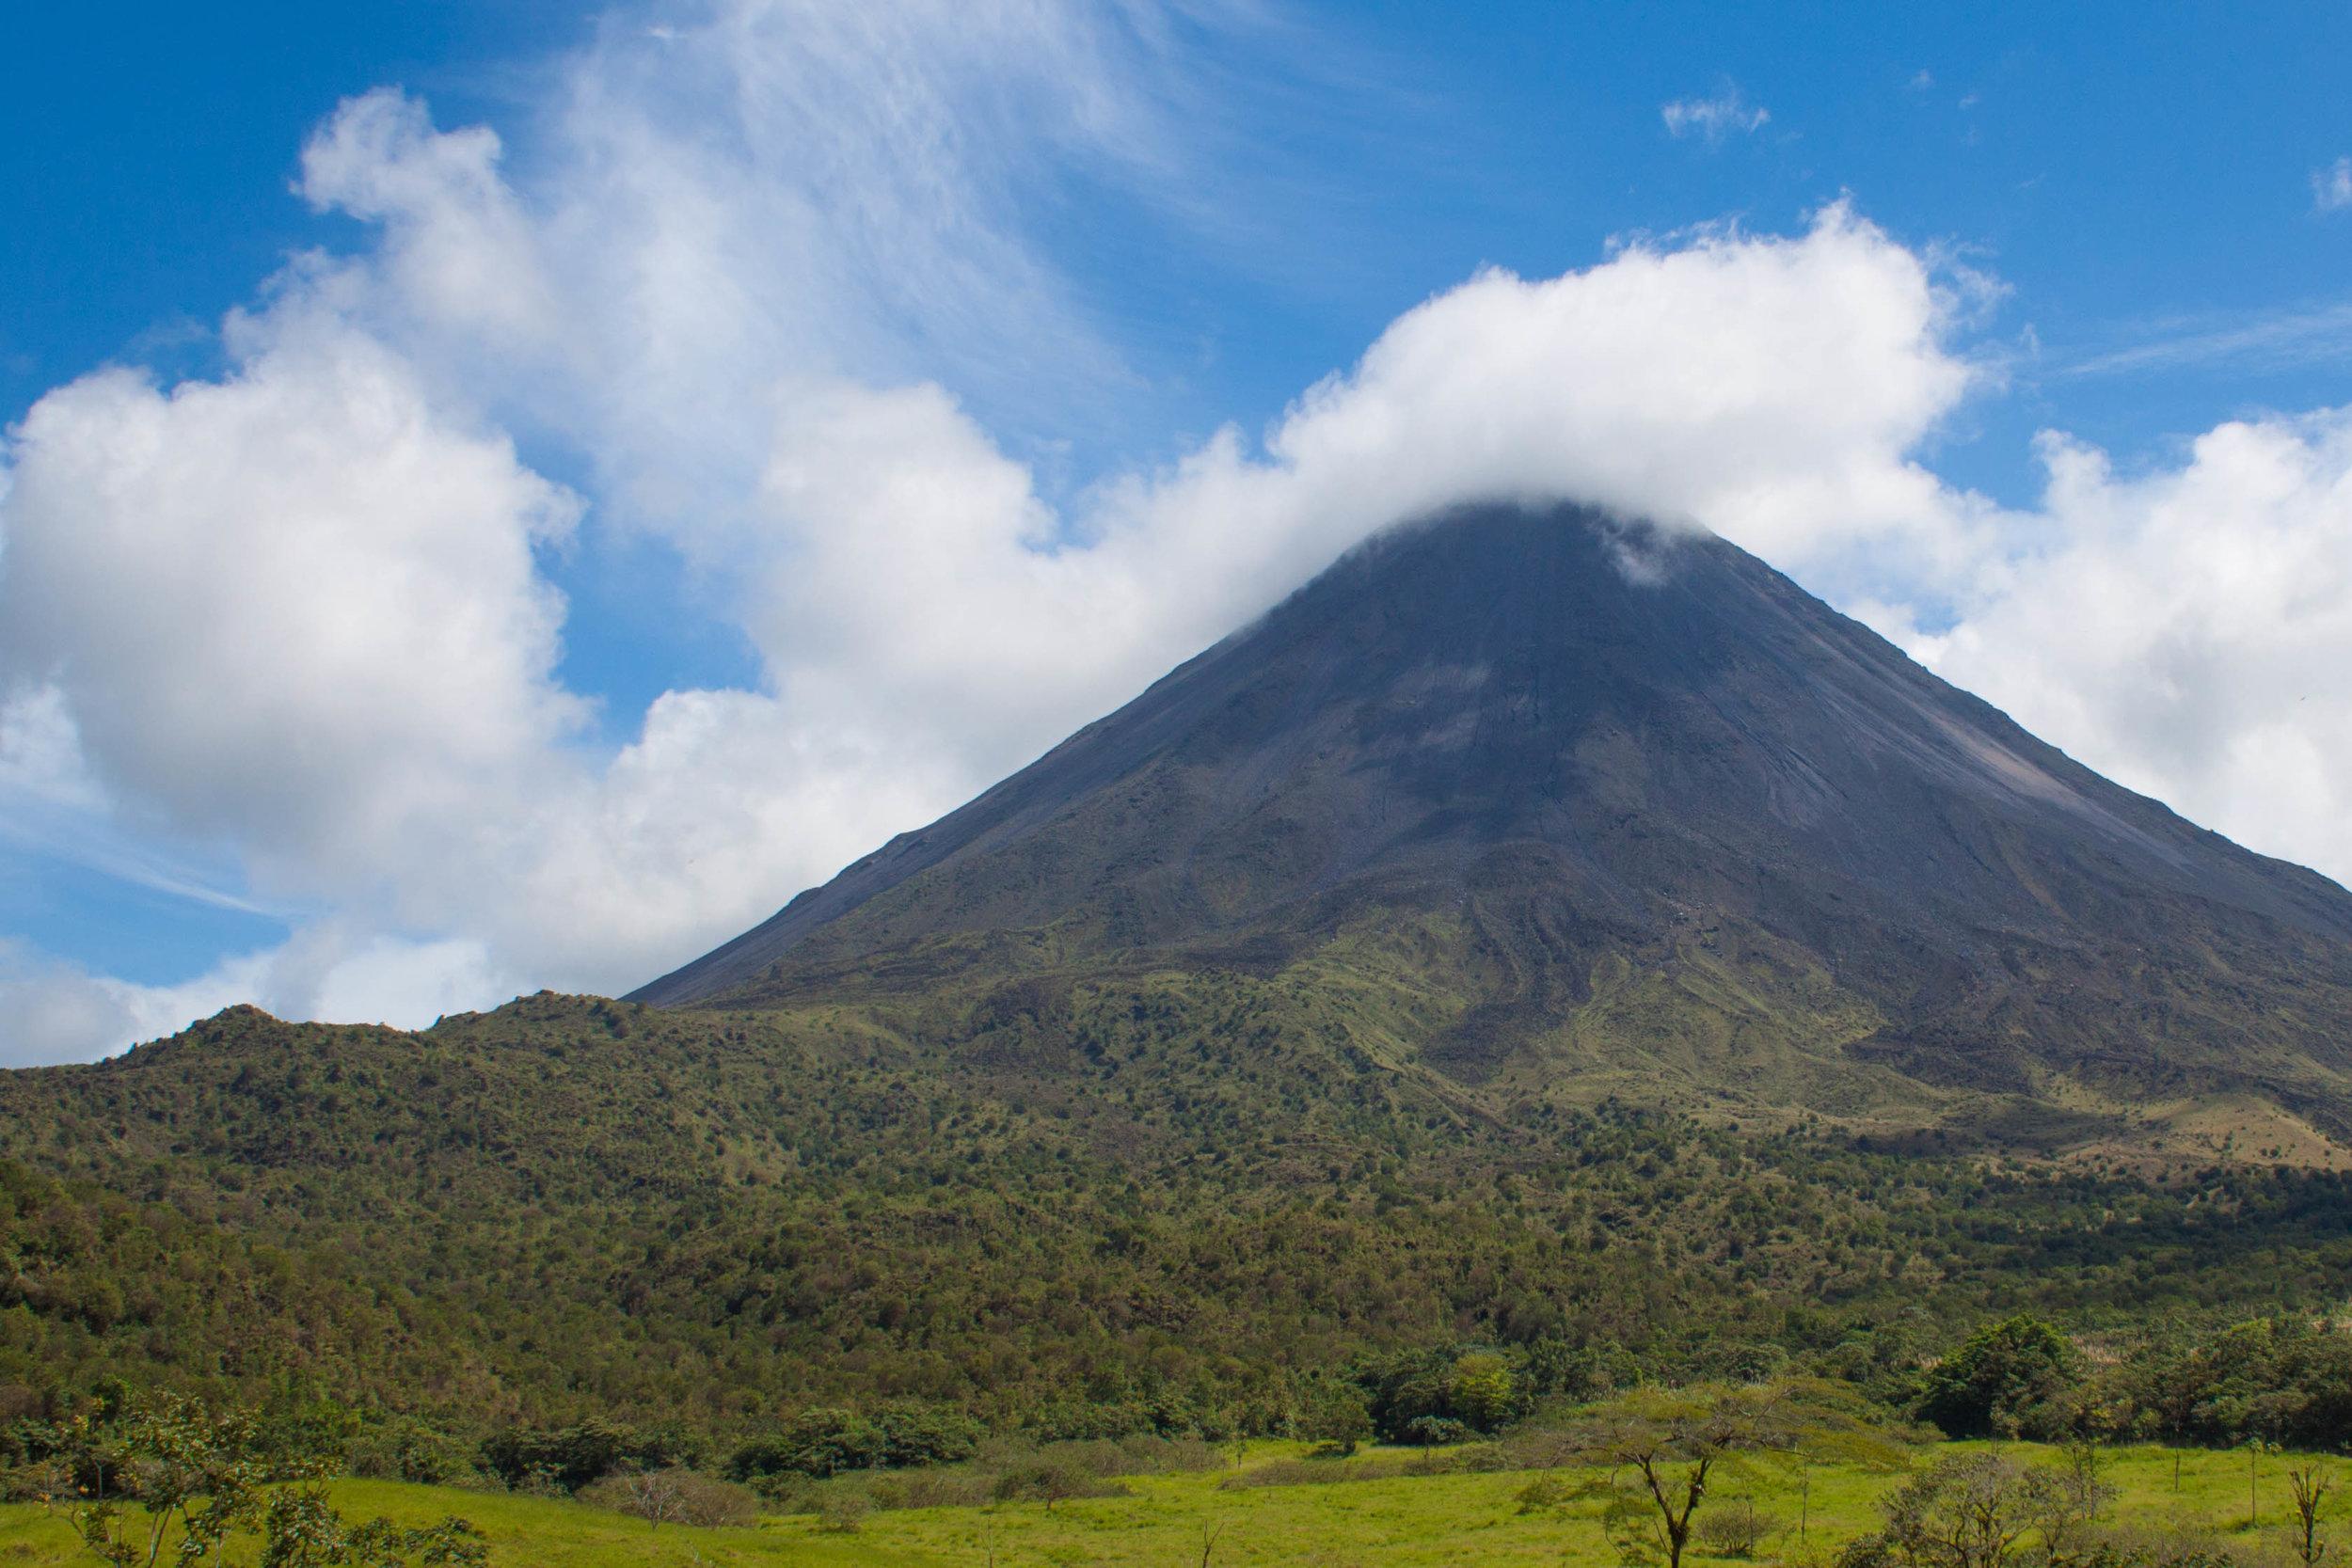 volcano clouds - arenal volcano, costa rica